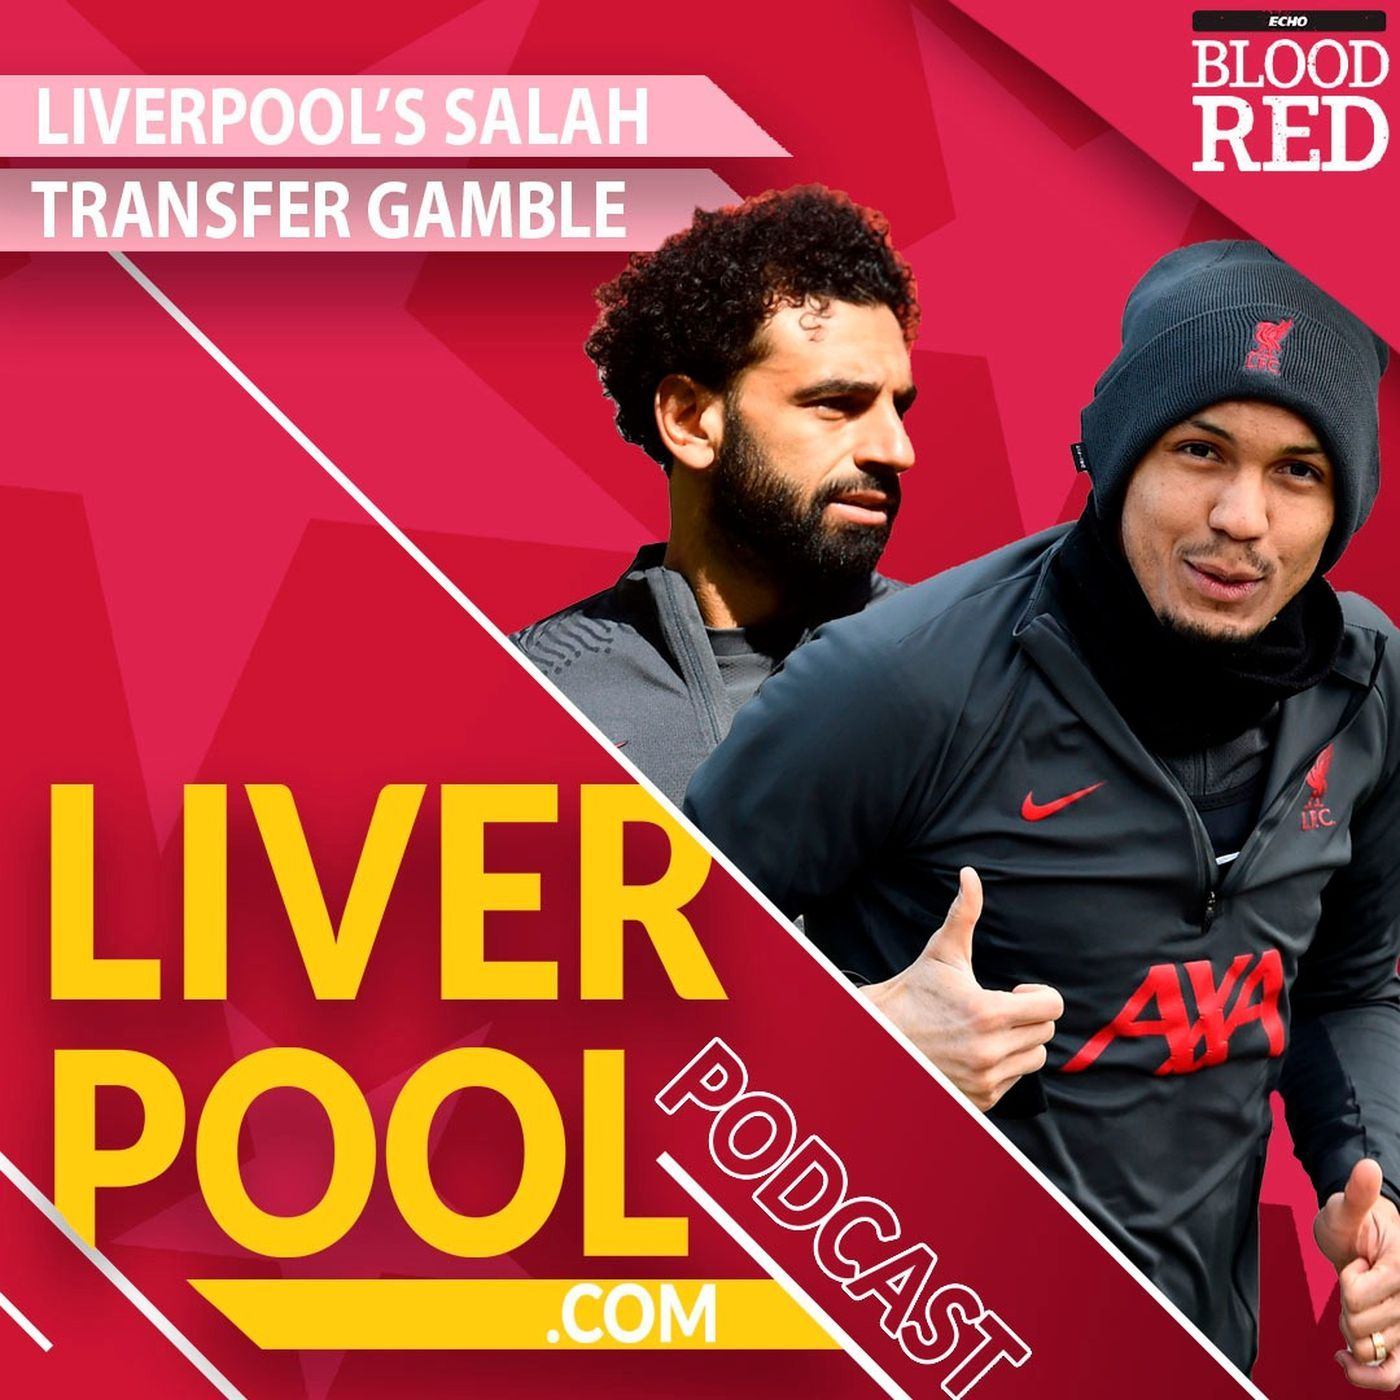 Liverpool.com podcast: Liverpool's Mohamed Salah transfer gamble | Fabinho conundrum returns ahead of Man Utd visit